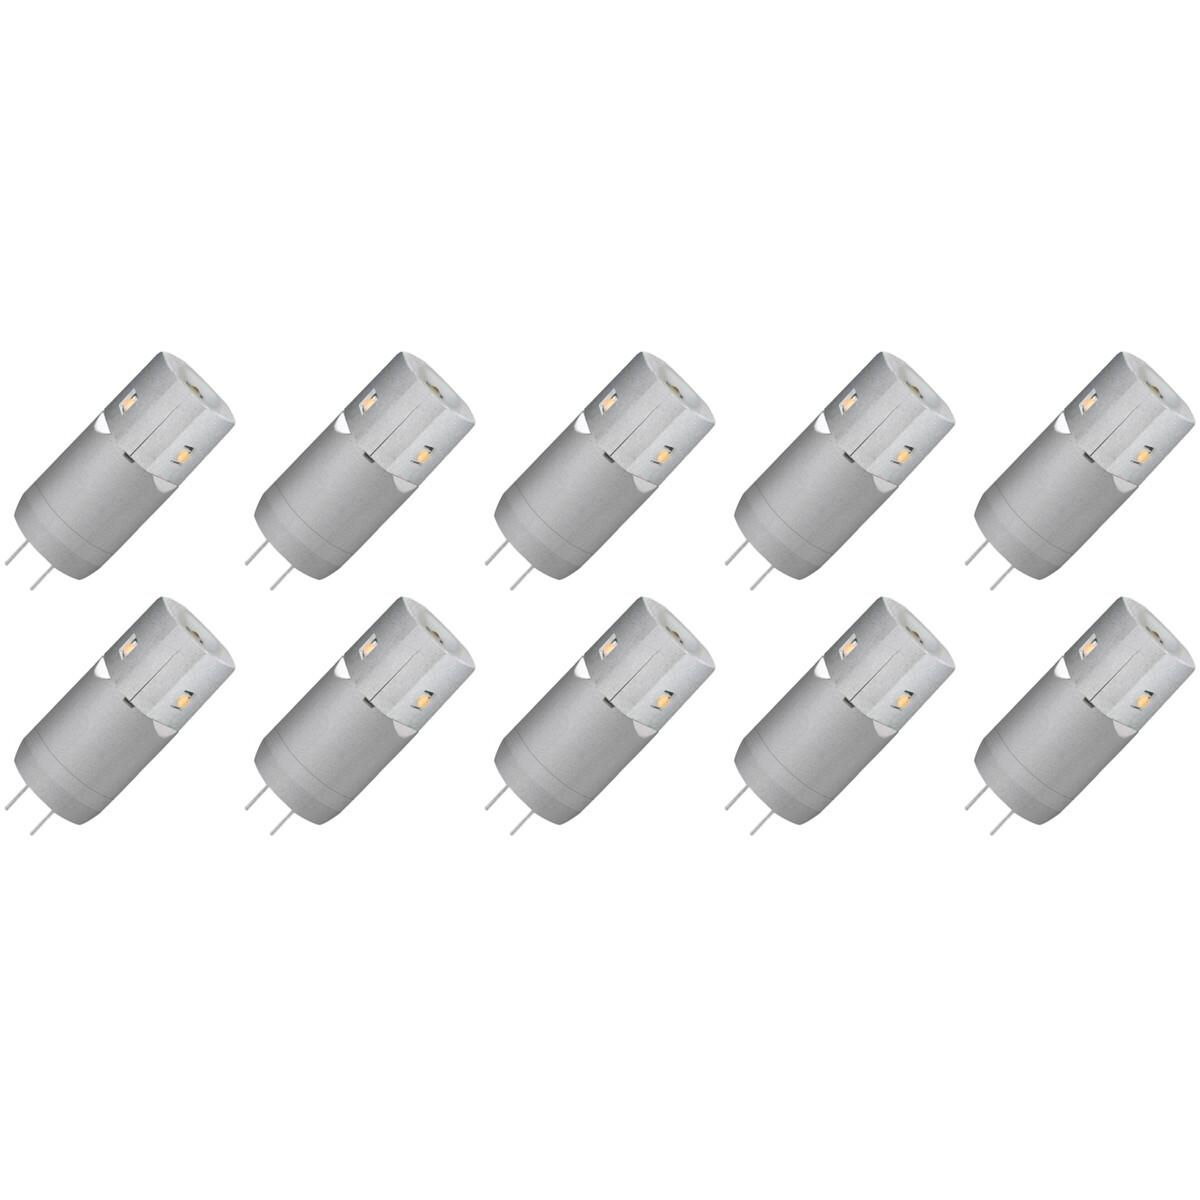 MEGAMAN - LED Lamp 10 Pack - Storm - G4 Fitting - 2W - Warm Wit 3000K | Vervangt 10W